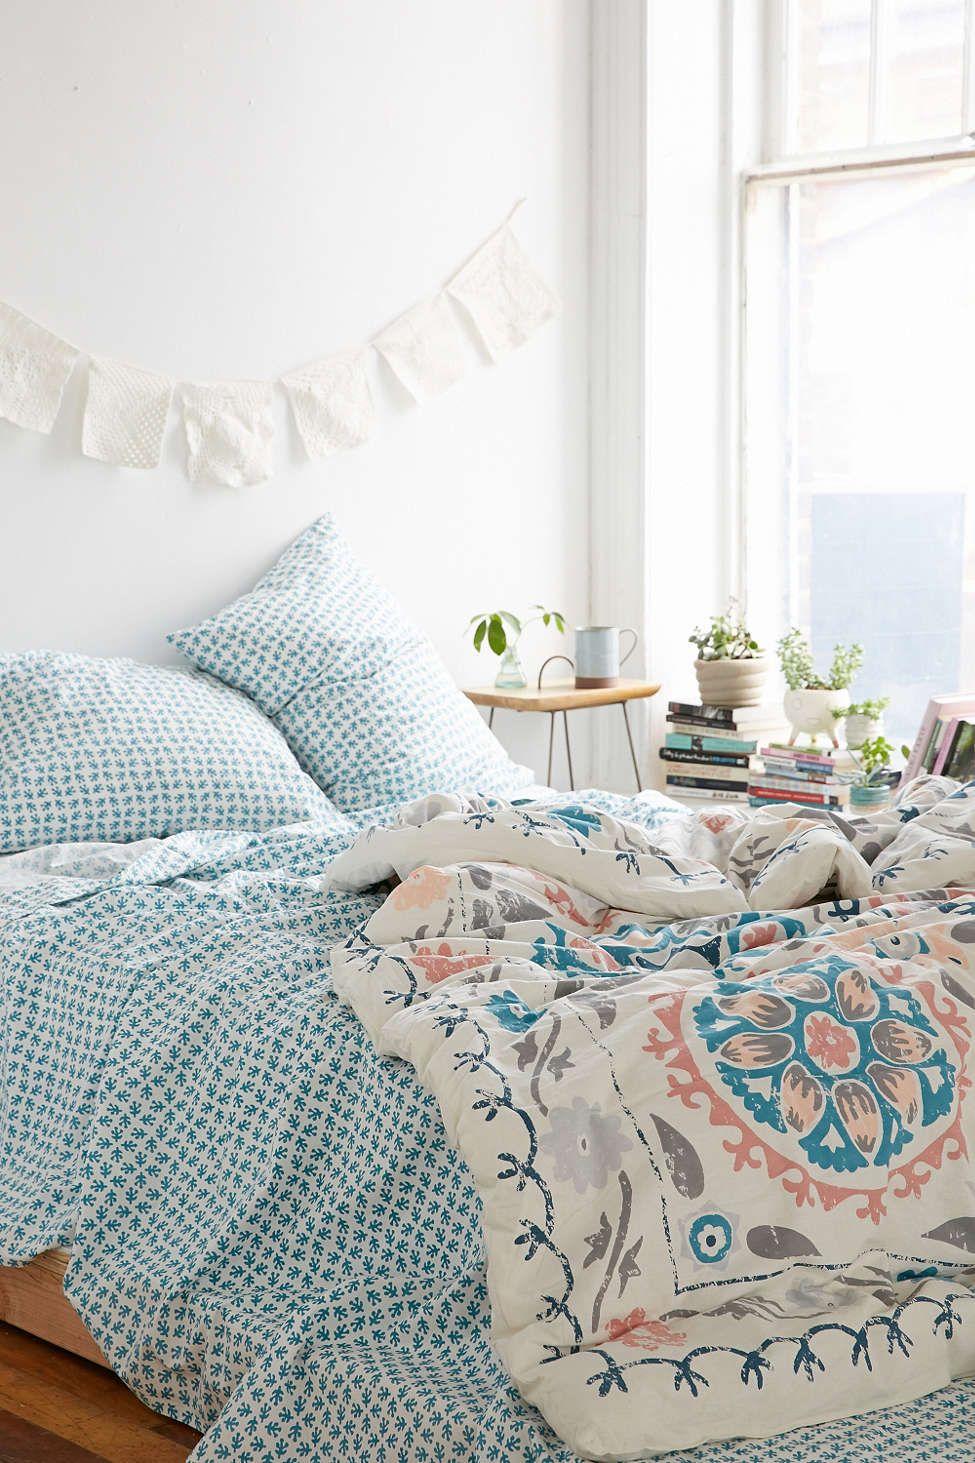 plum bow tamara suzani comforter snooze set dream house pinterest schlafzimmer wohnen. Black Bedroom Furniture Sets. Home Design Ideas